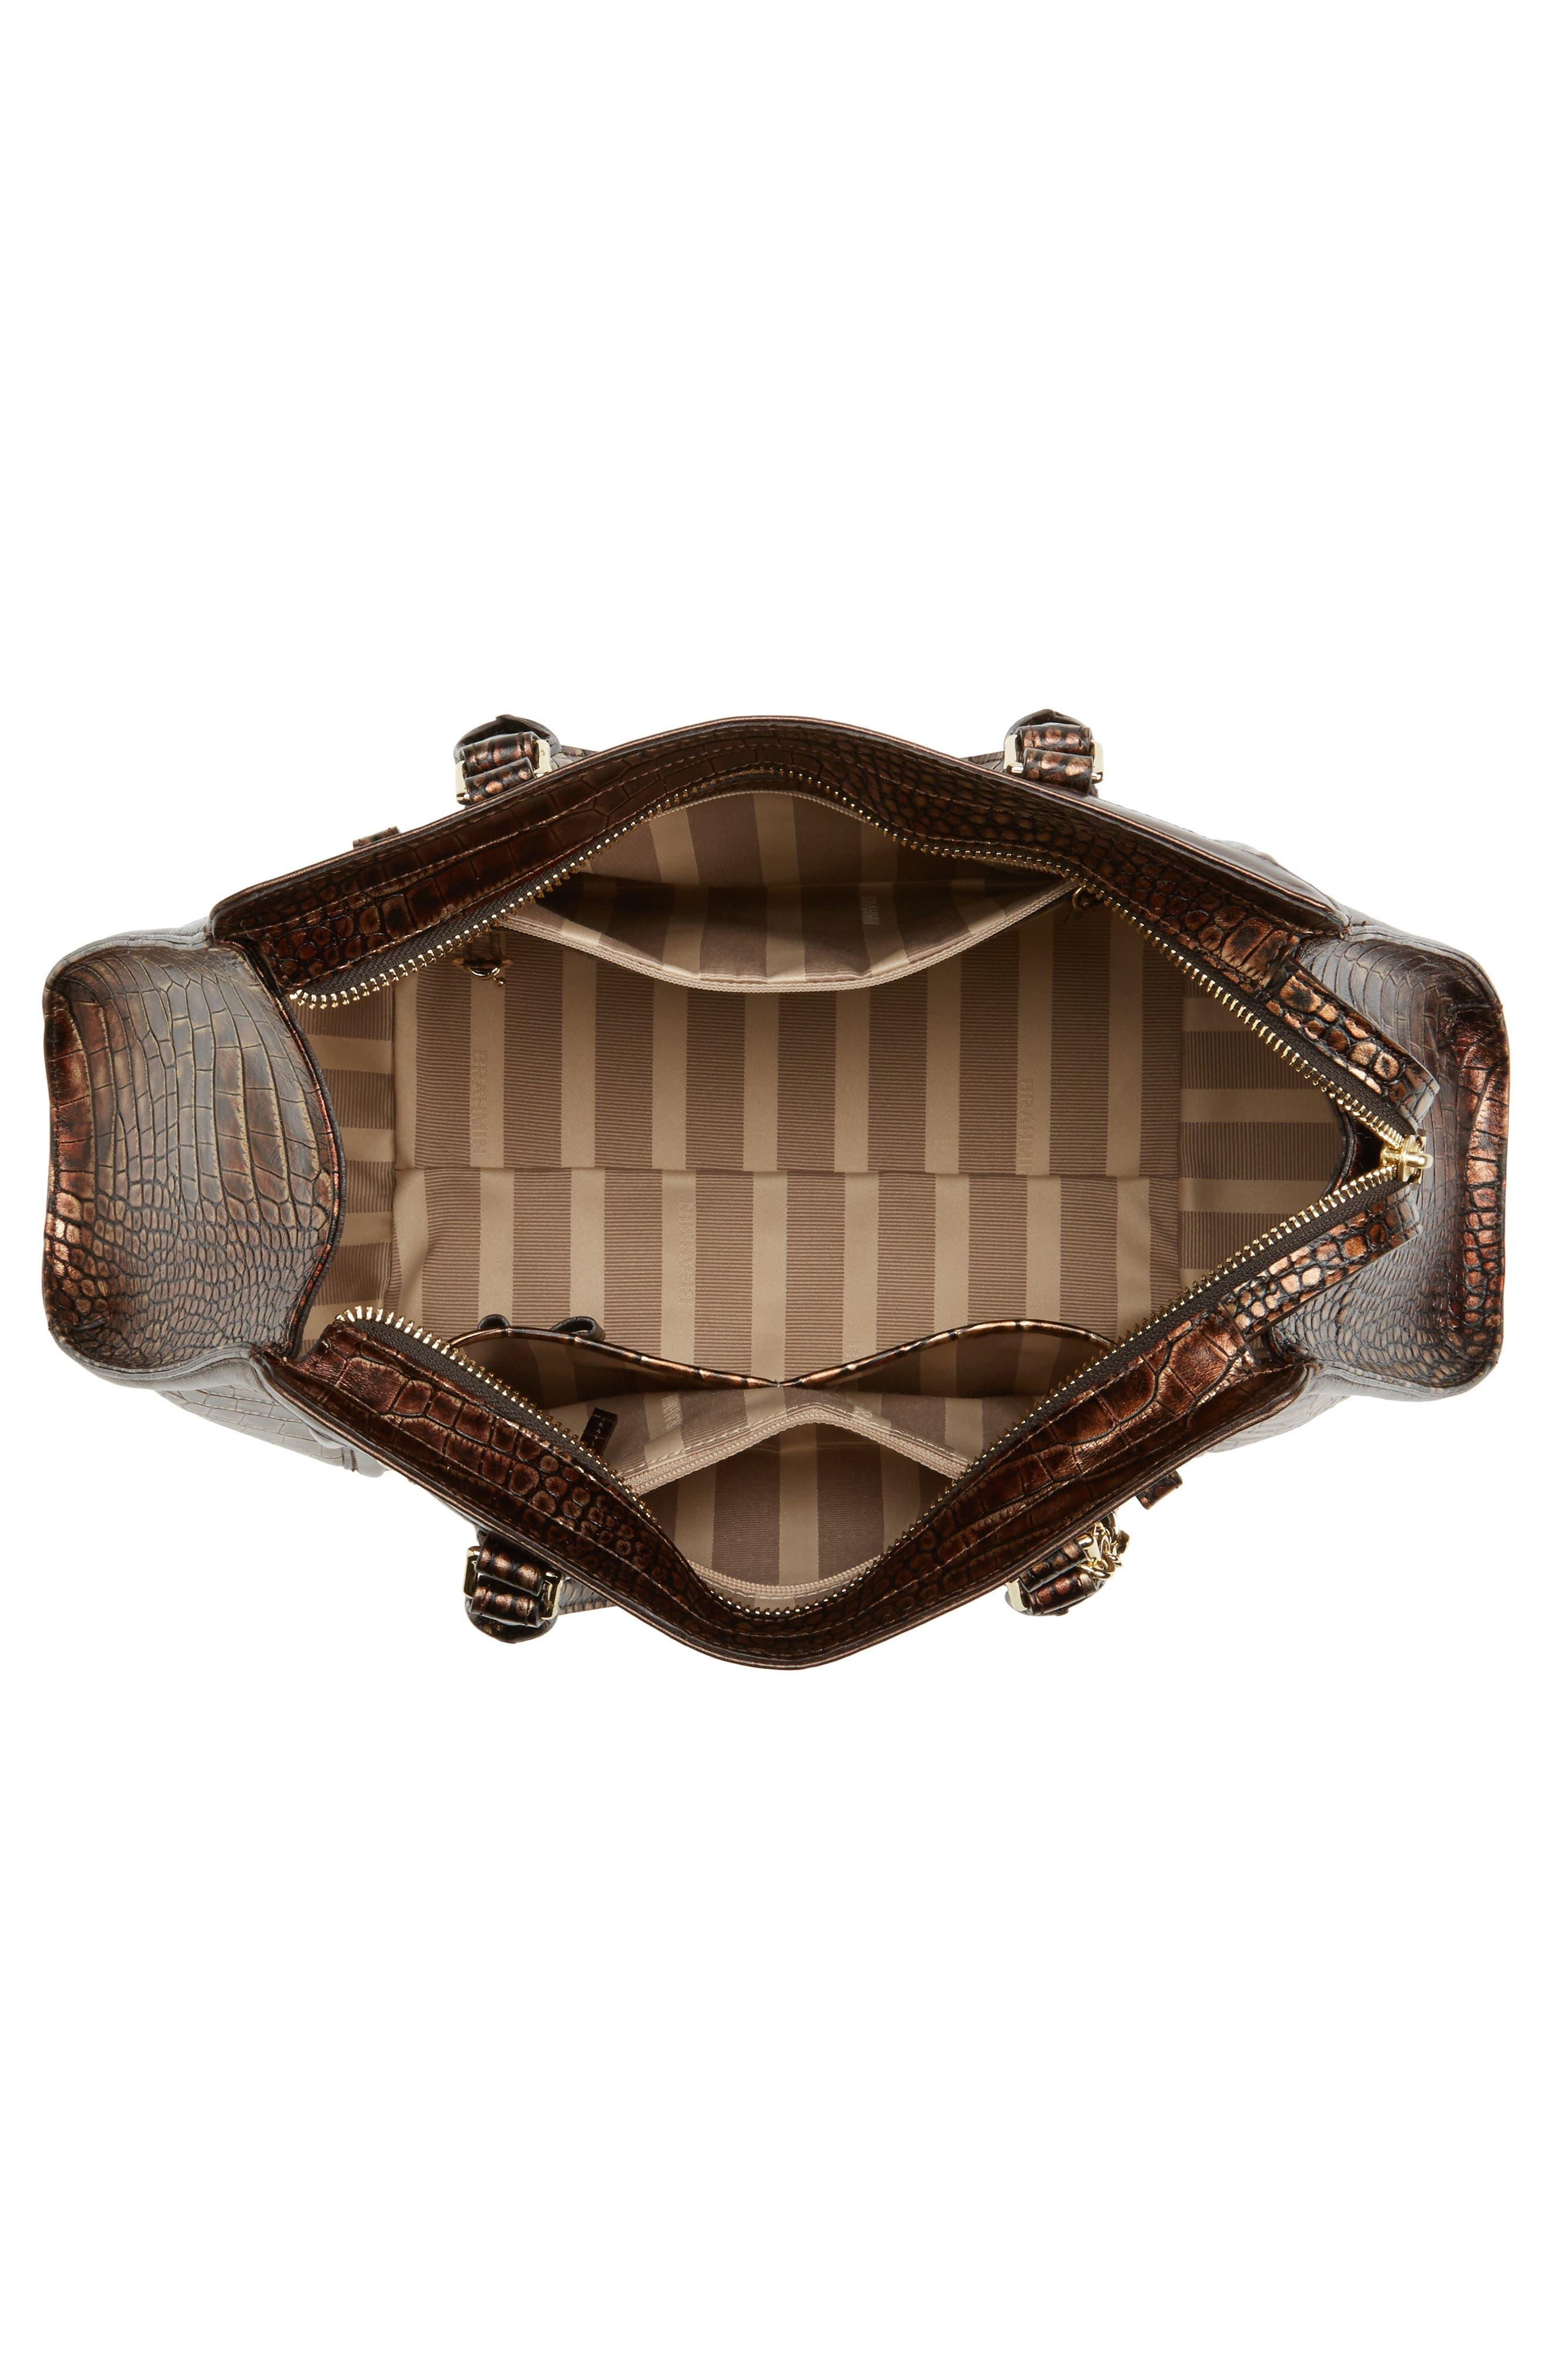 Milan Arden Embossed Leather Satchel,                             Alternate thumbnail 4, color,                             200